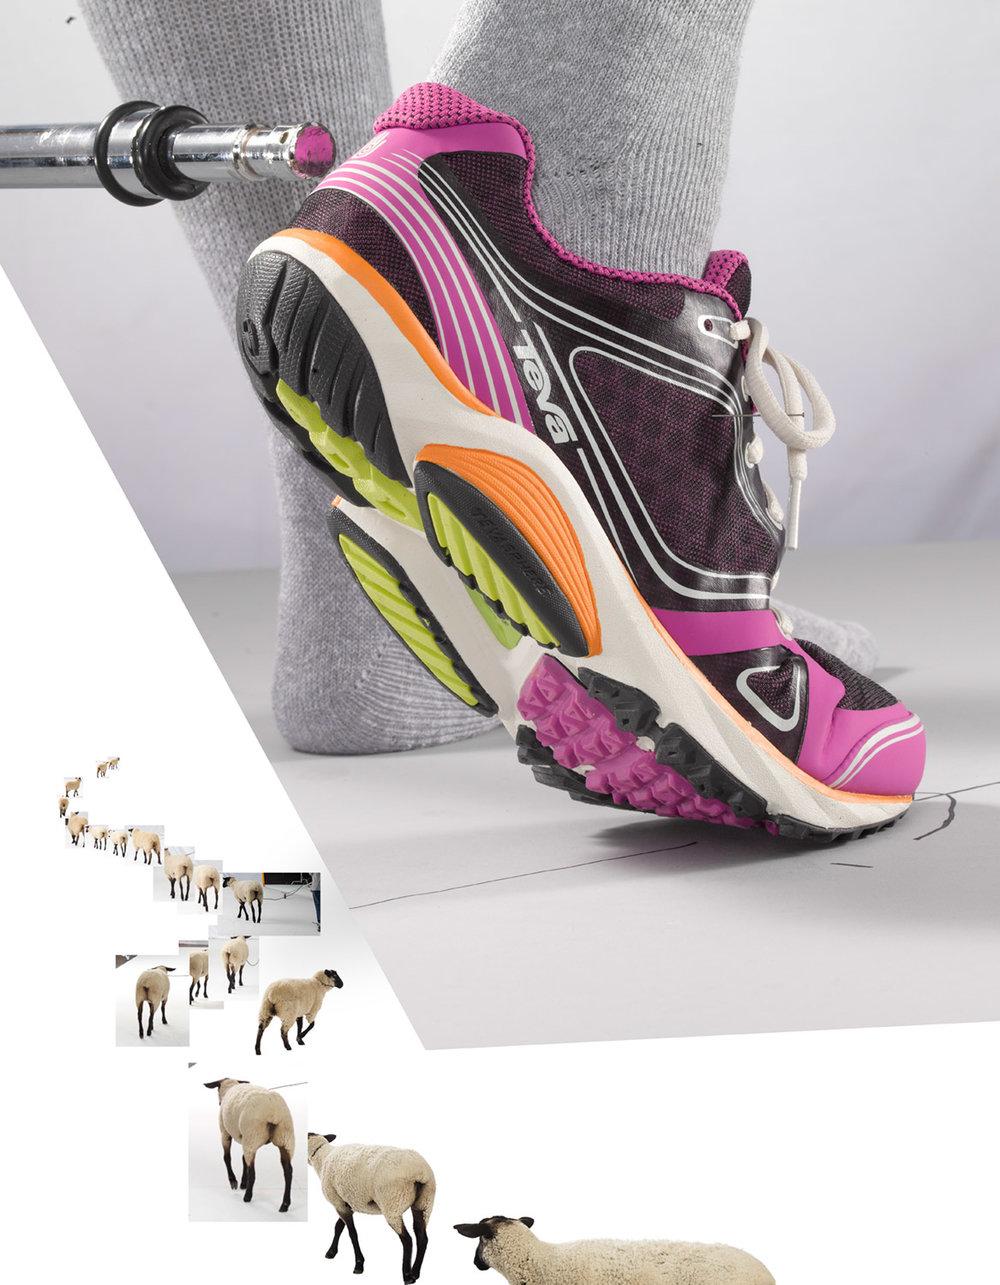 Un-retouched Pink TEVA Footwear